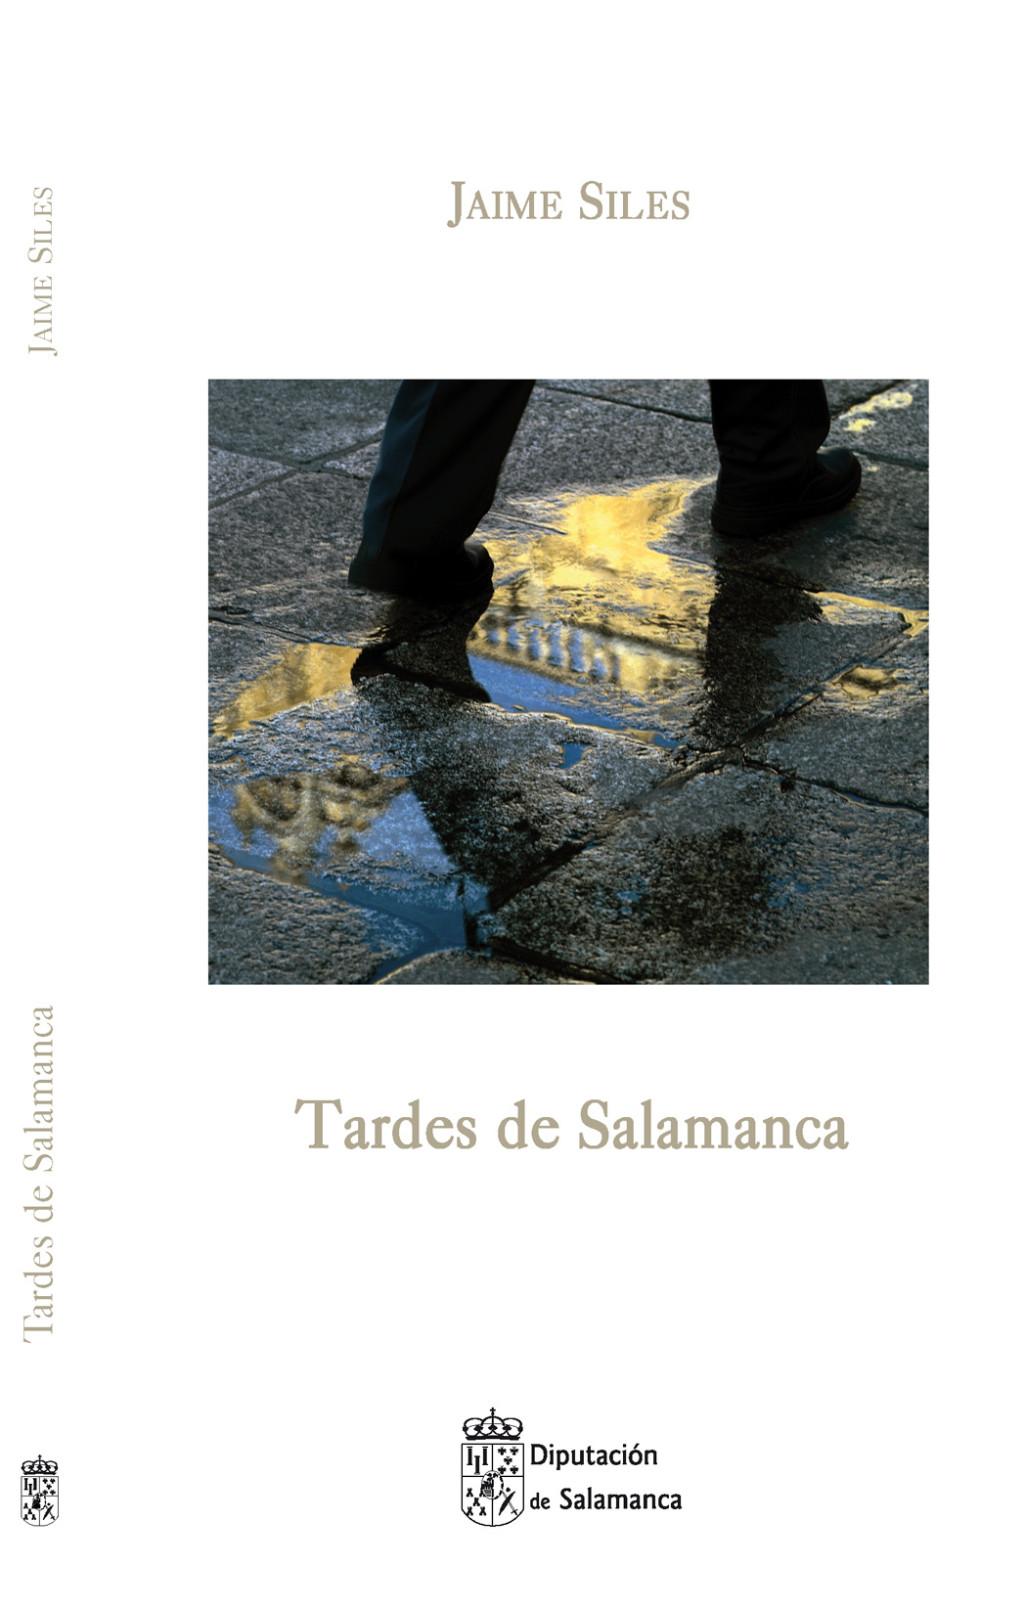 Cubierta del libro de Jaime Siles, Tardes de Salamanca (Salamanca, 2014)